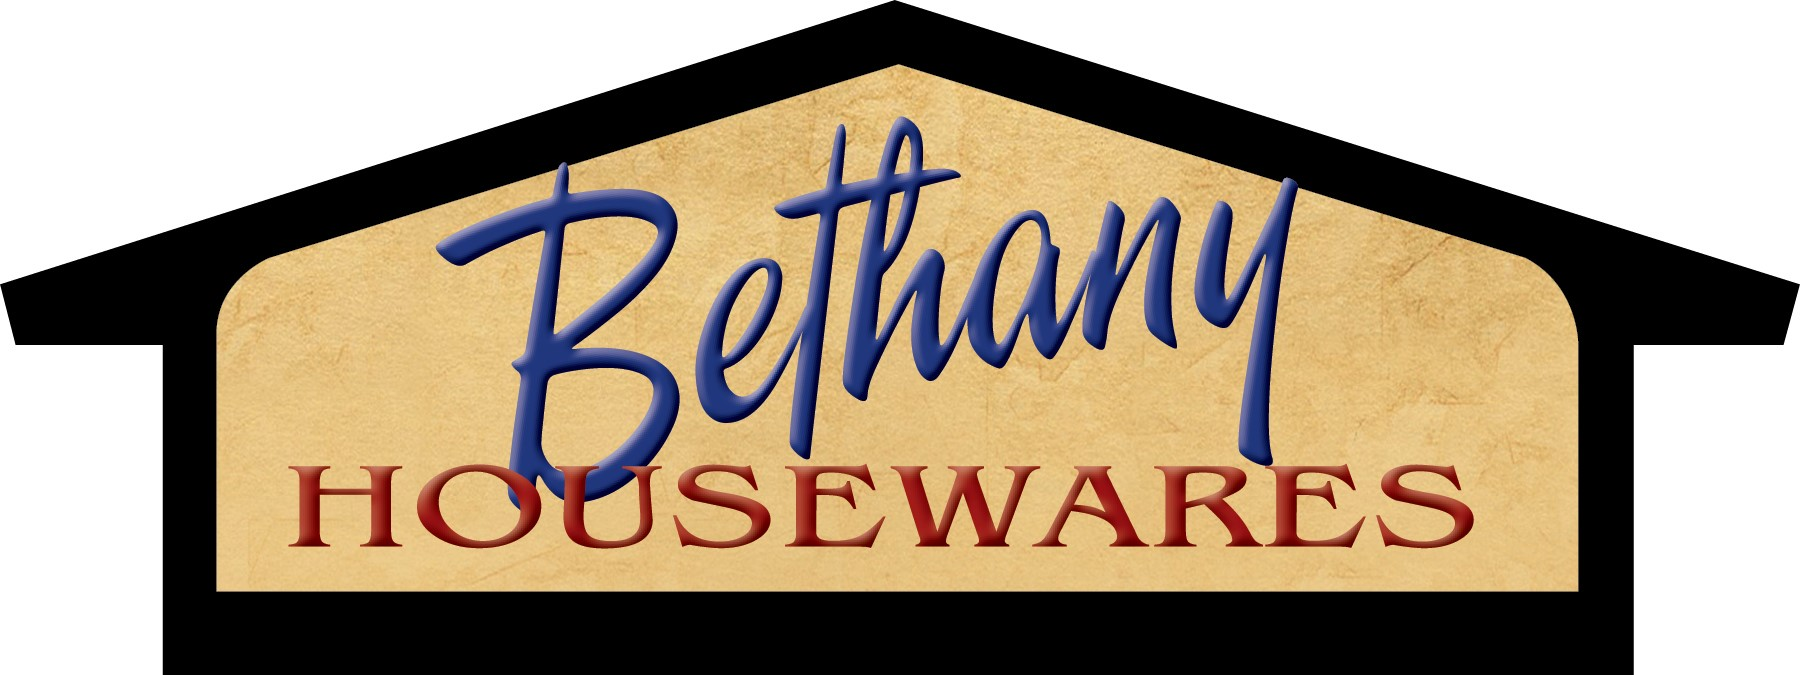 Bethany Housewares, Inc